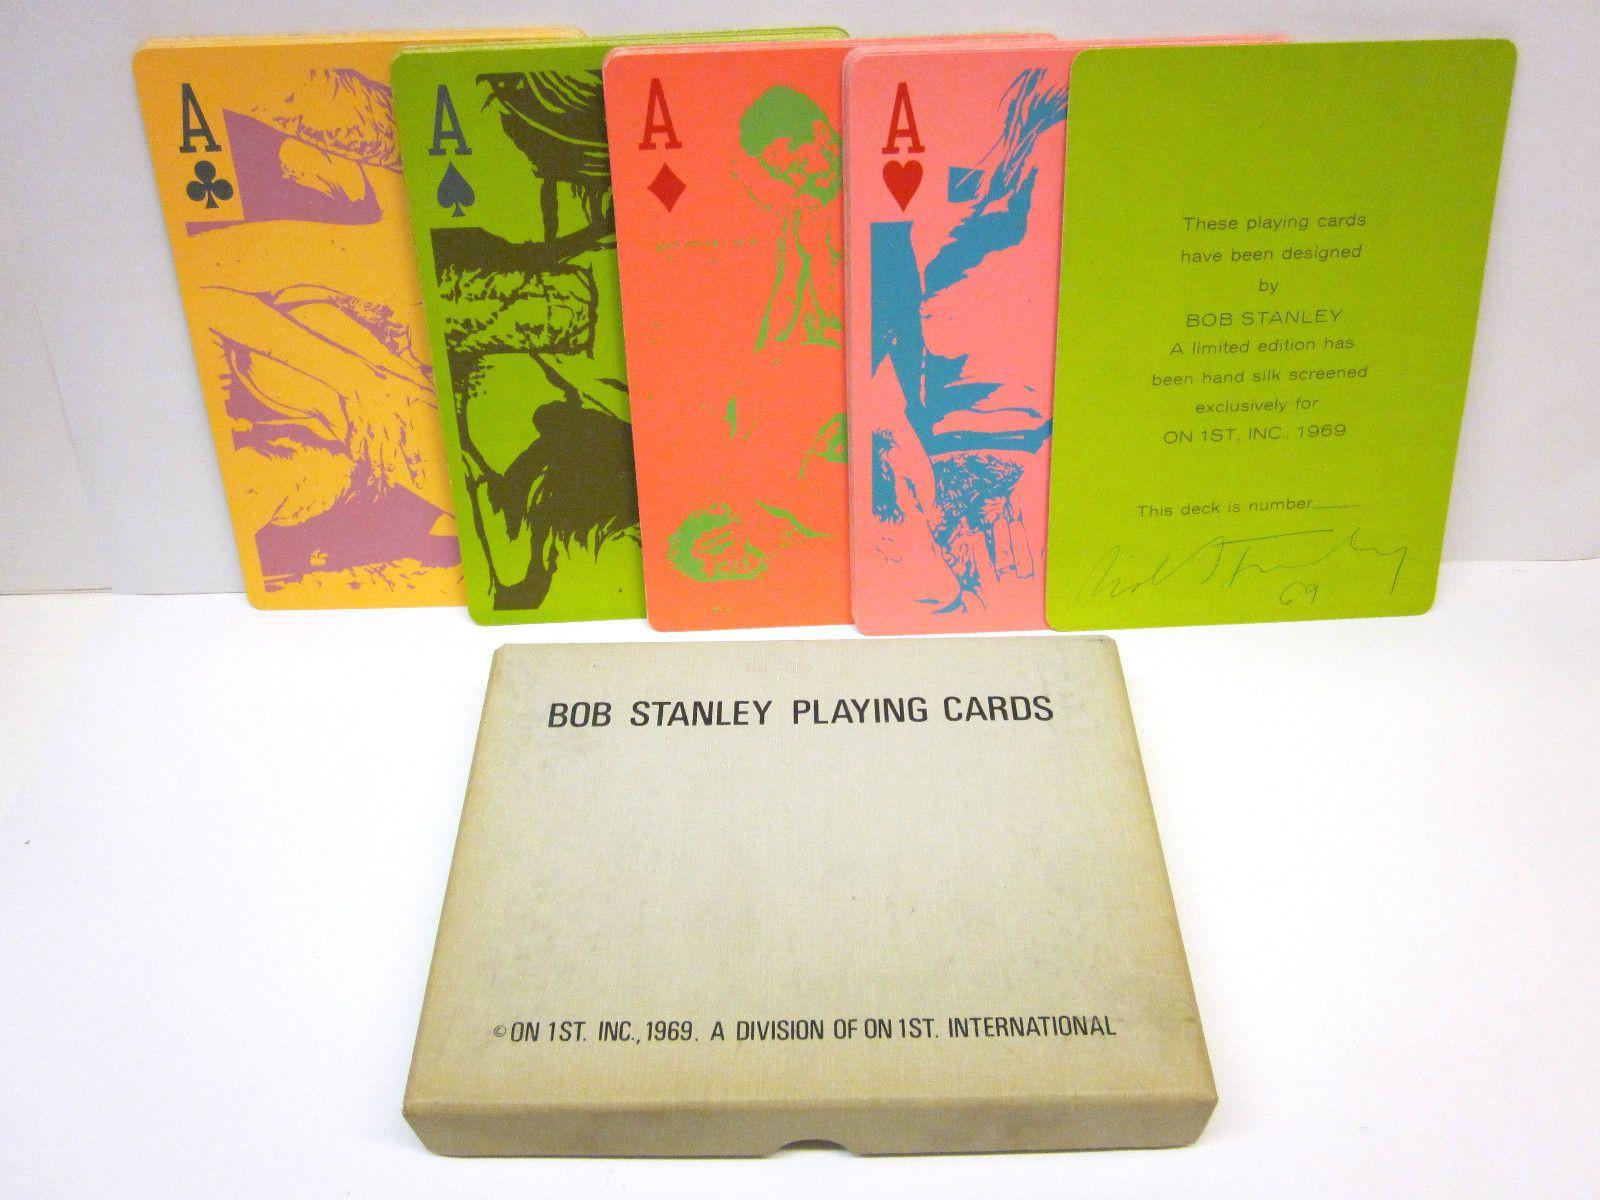 RARE Robert Bob Stanley Pop Art Erotic Playing Cards Artist Signed 1969 | eBay